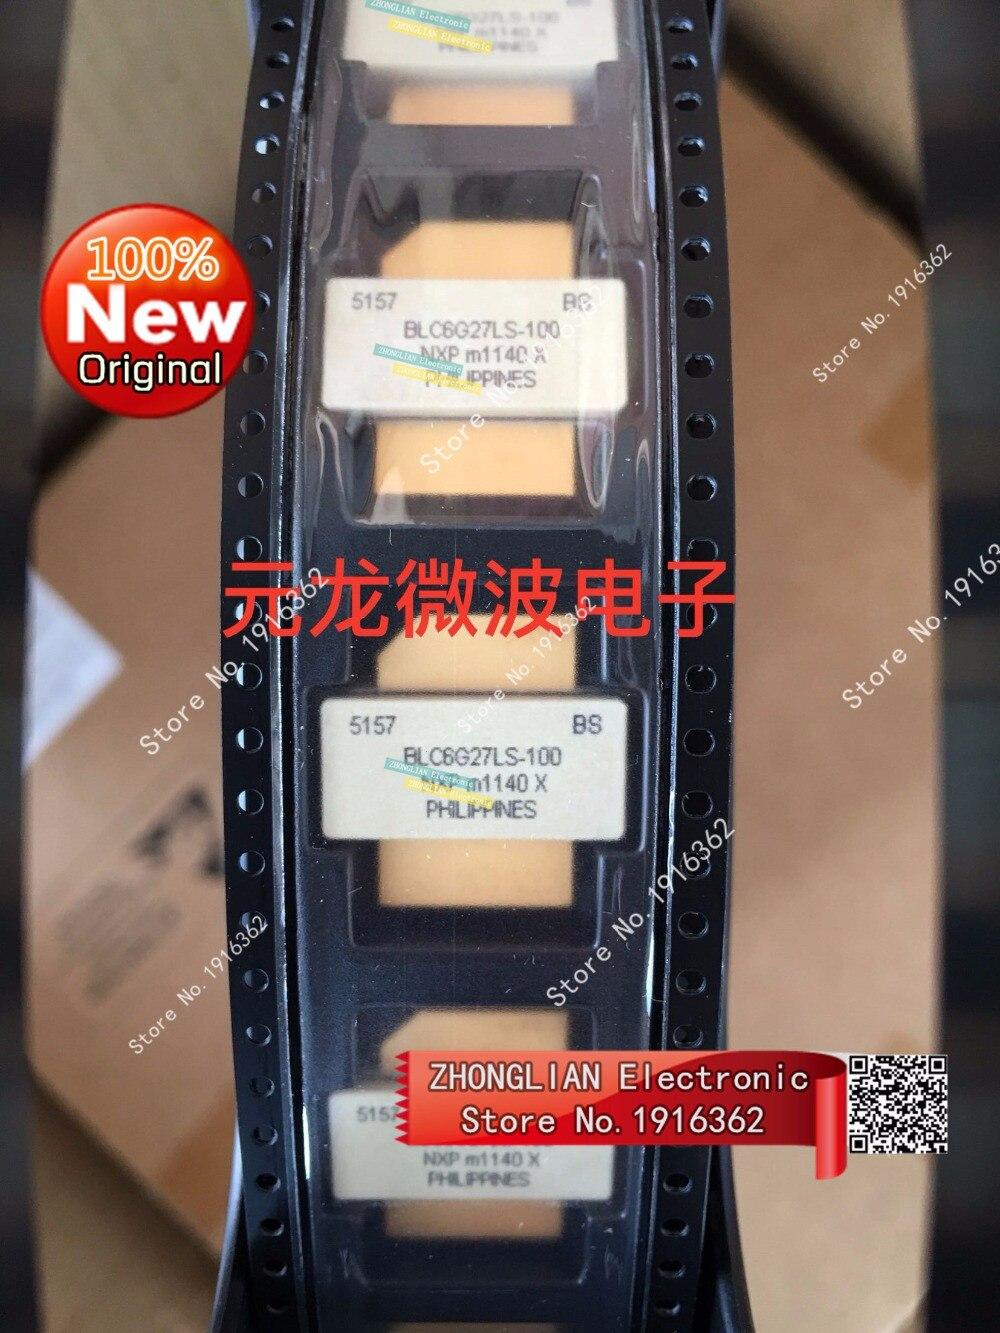 1pcs Quality 11 Color Max Professional Eyeshadow Palette: 1pcs/lot MRF7S16150H Brand New, Original Quality Assurance